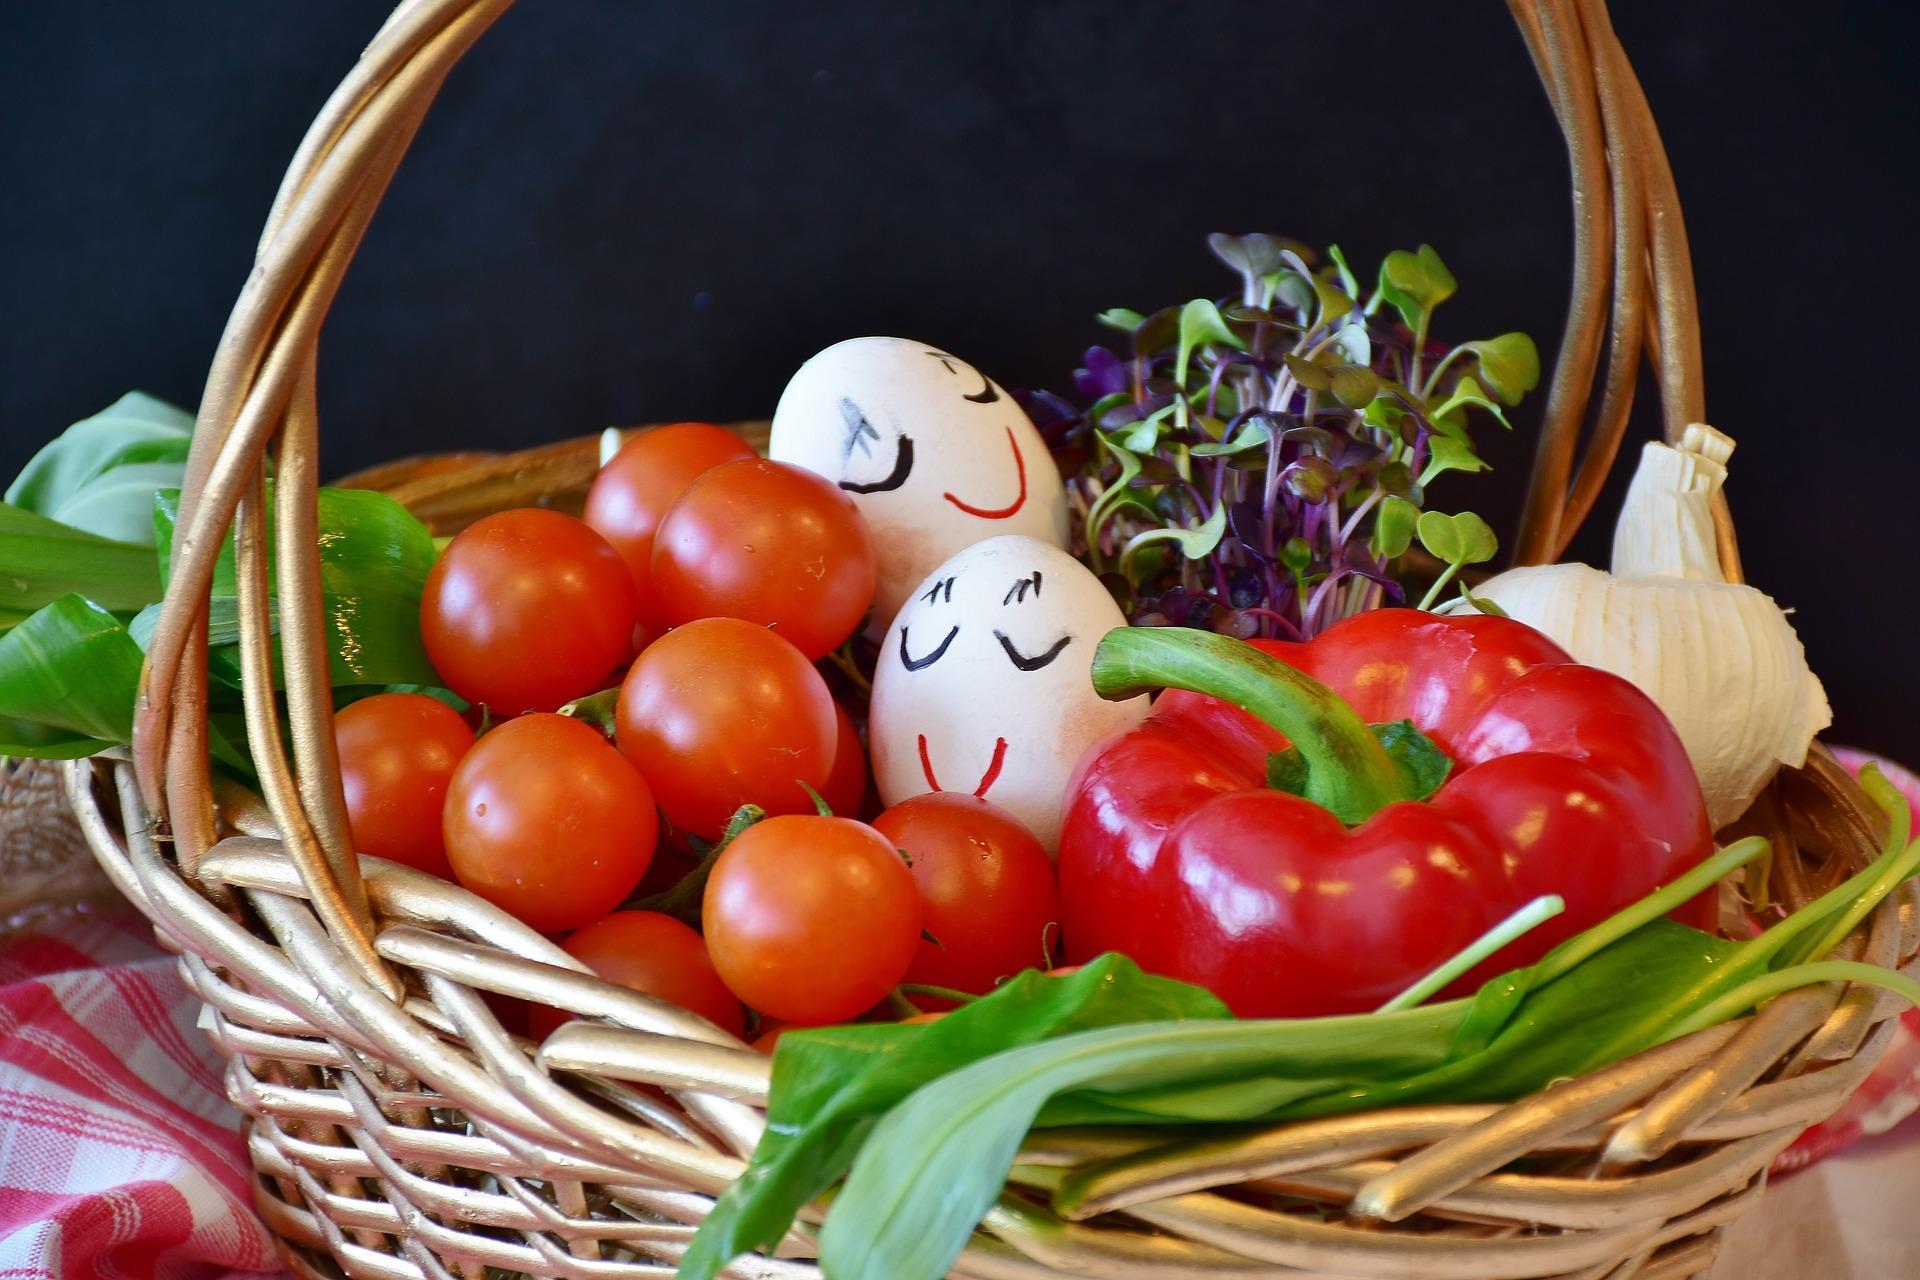 vegetables-2179805_1920.jpg